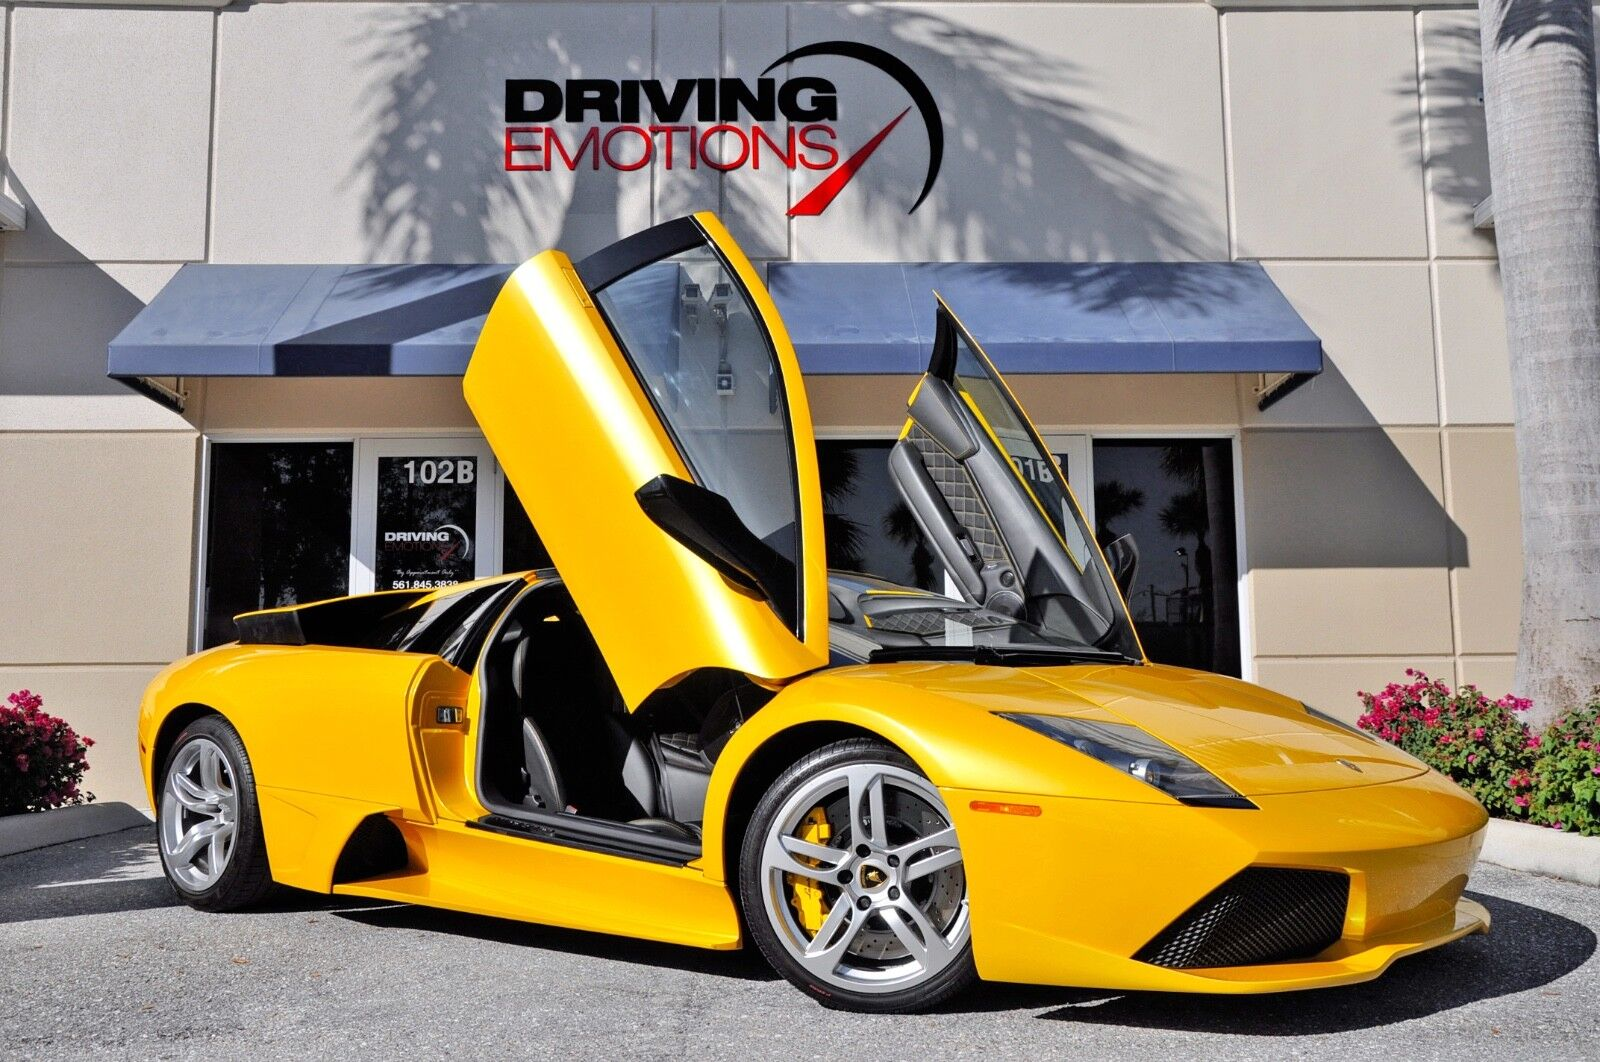 2008 Lamborghini Murcielago LP640 Coupe E-Gear 2008 LAMBORGHINI MURCIELAGO LP640 COUPE! PEARL YELLOW! Q-CITURA! CARBON! LOADED!